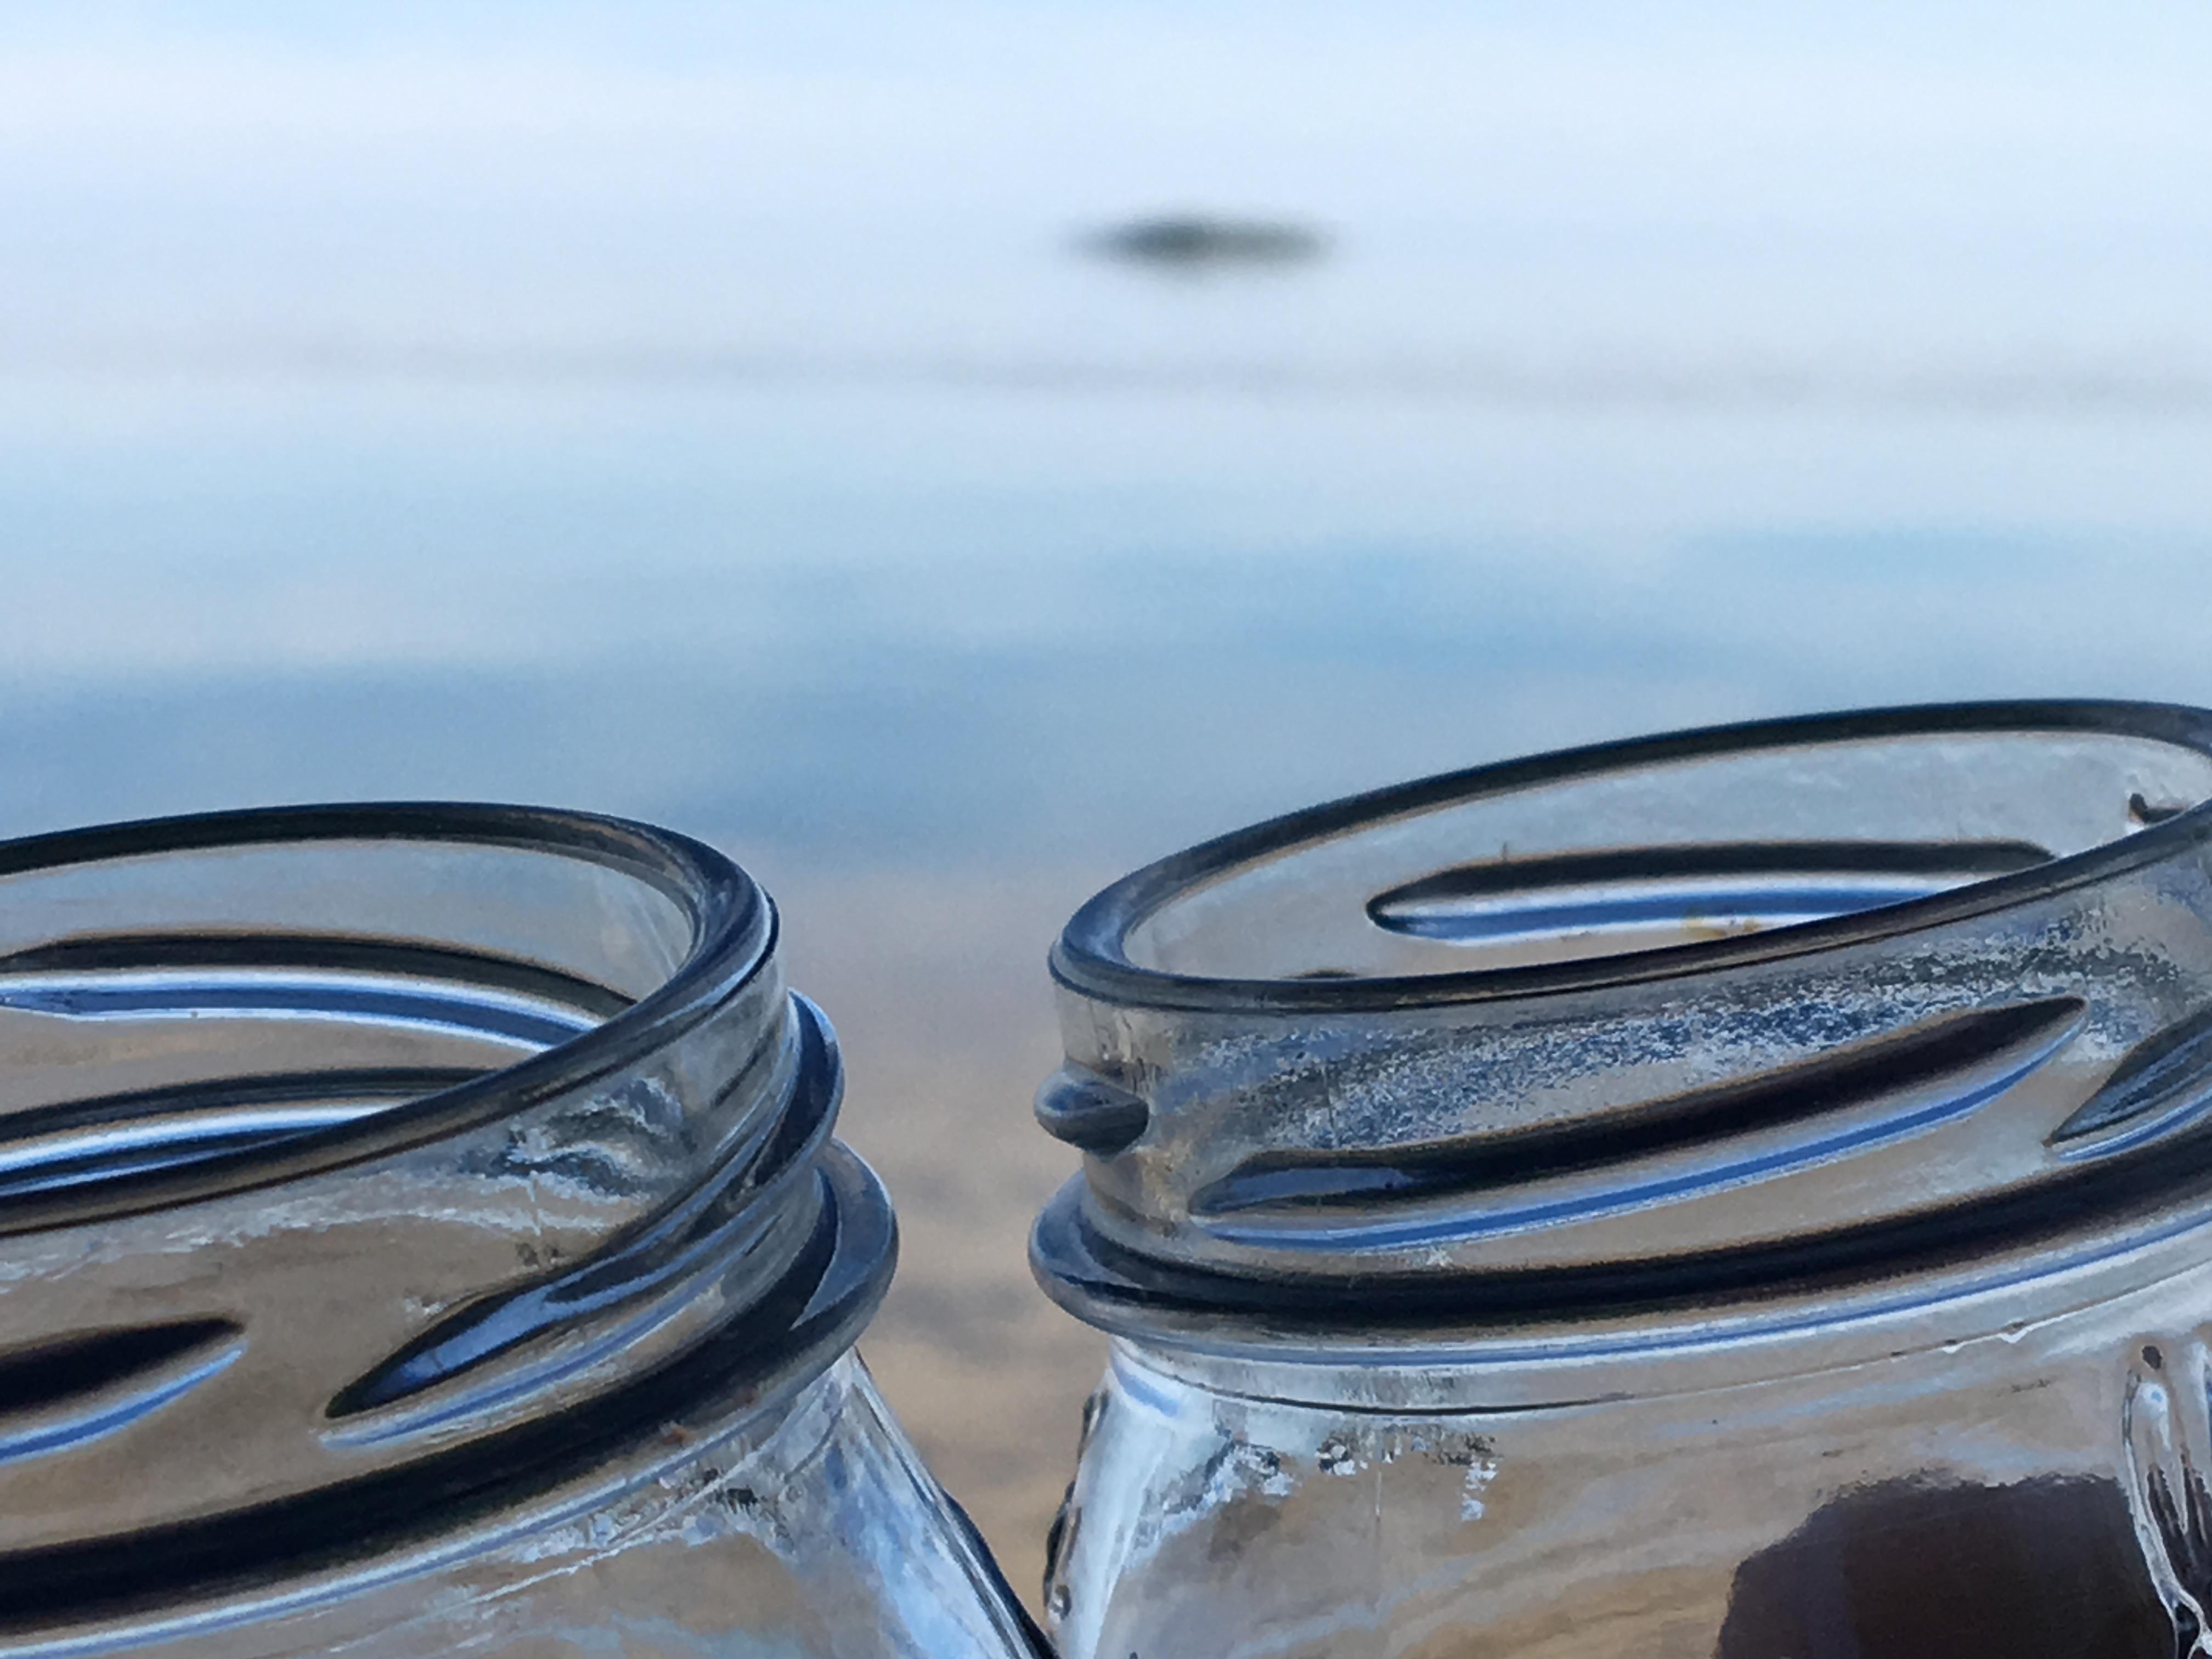 jelly jars & sunset